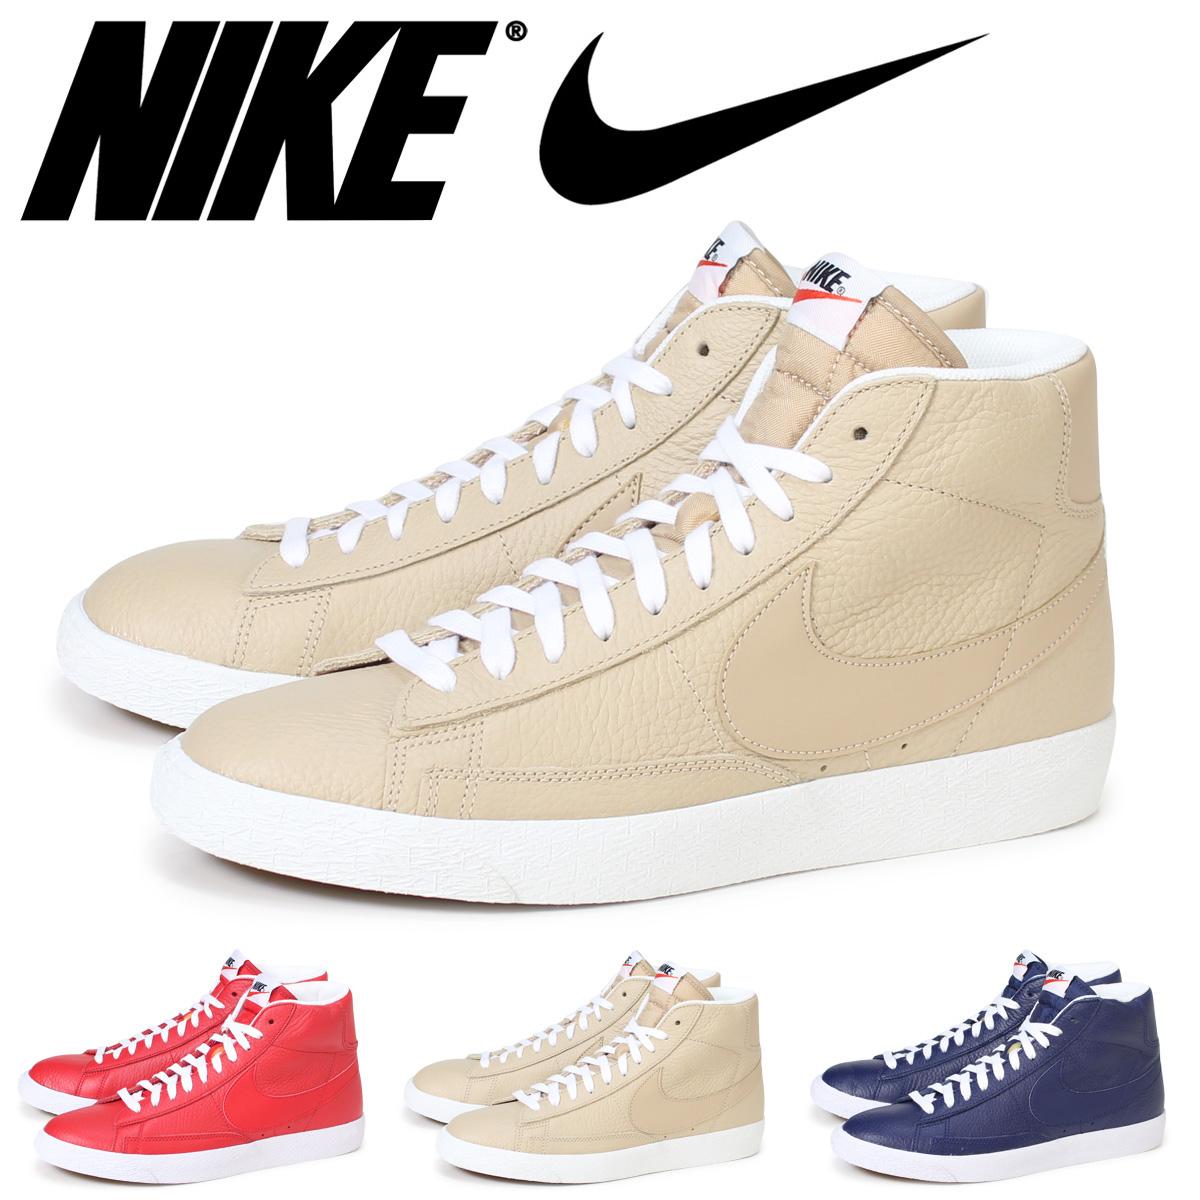 aliexpress official supplier new york NIKE Nike blazer sneakers BLAZER MID PREMIUM 09 429,988-202 429,988-402  429,988-604 men's lady's shoes